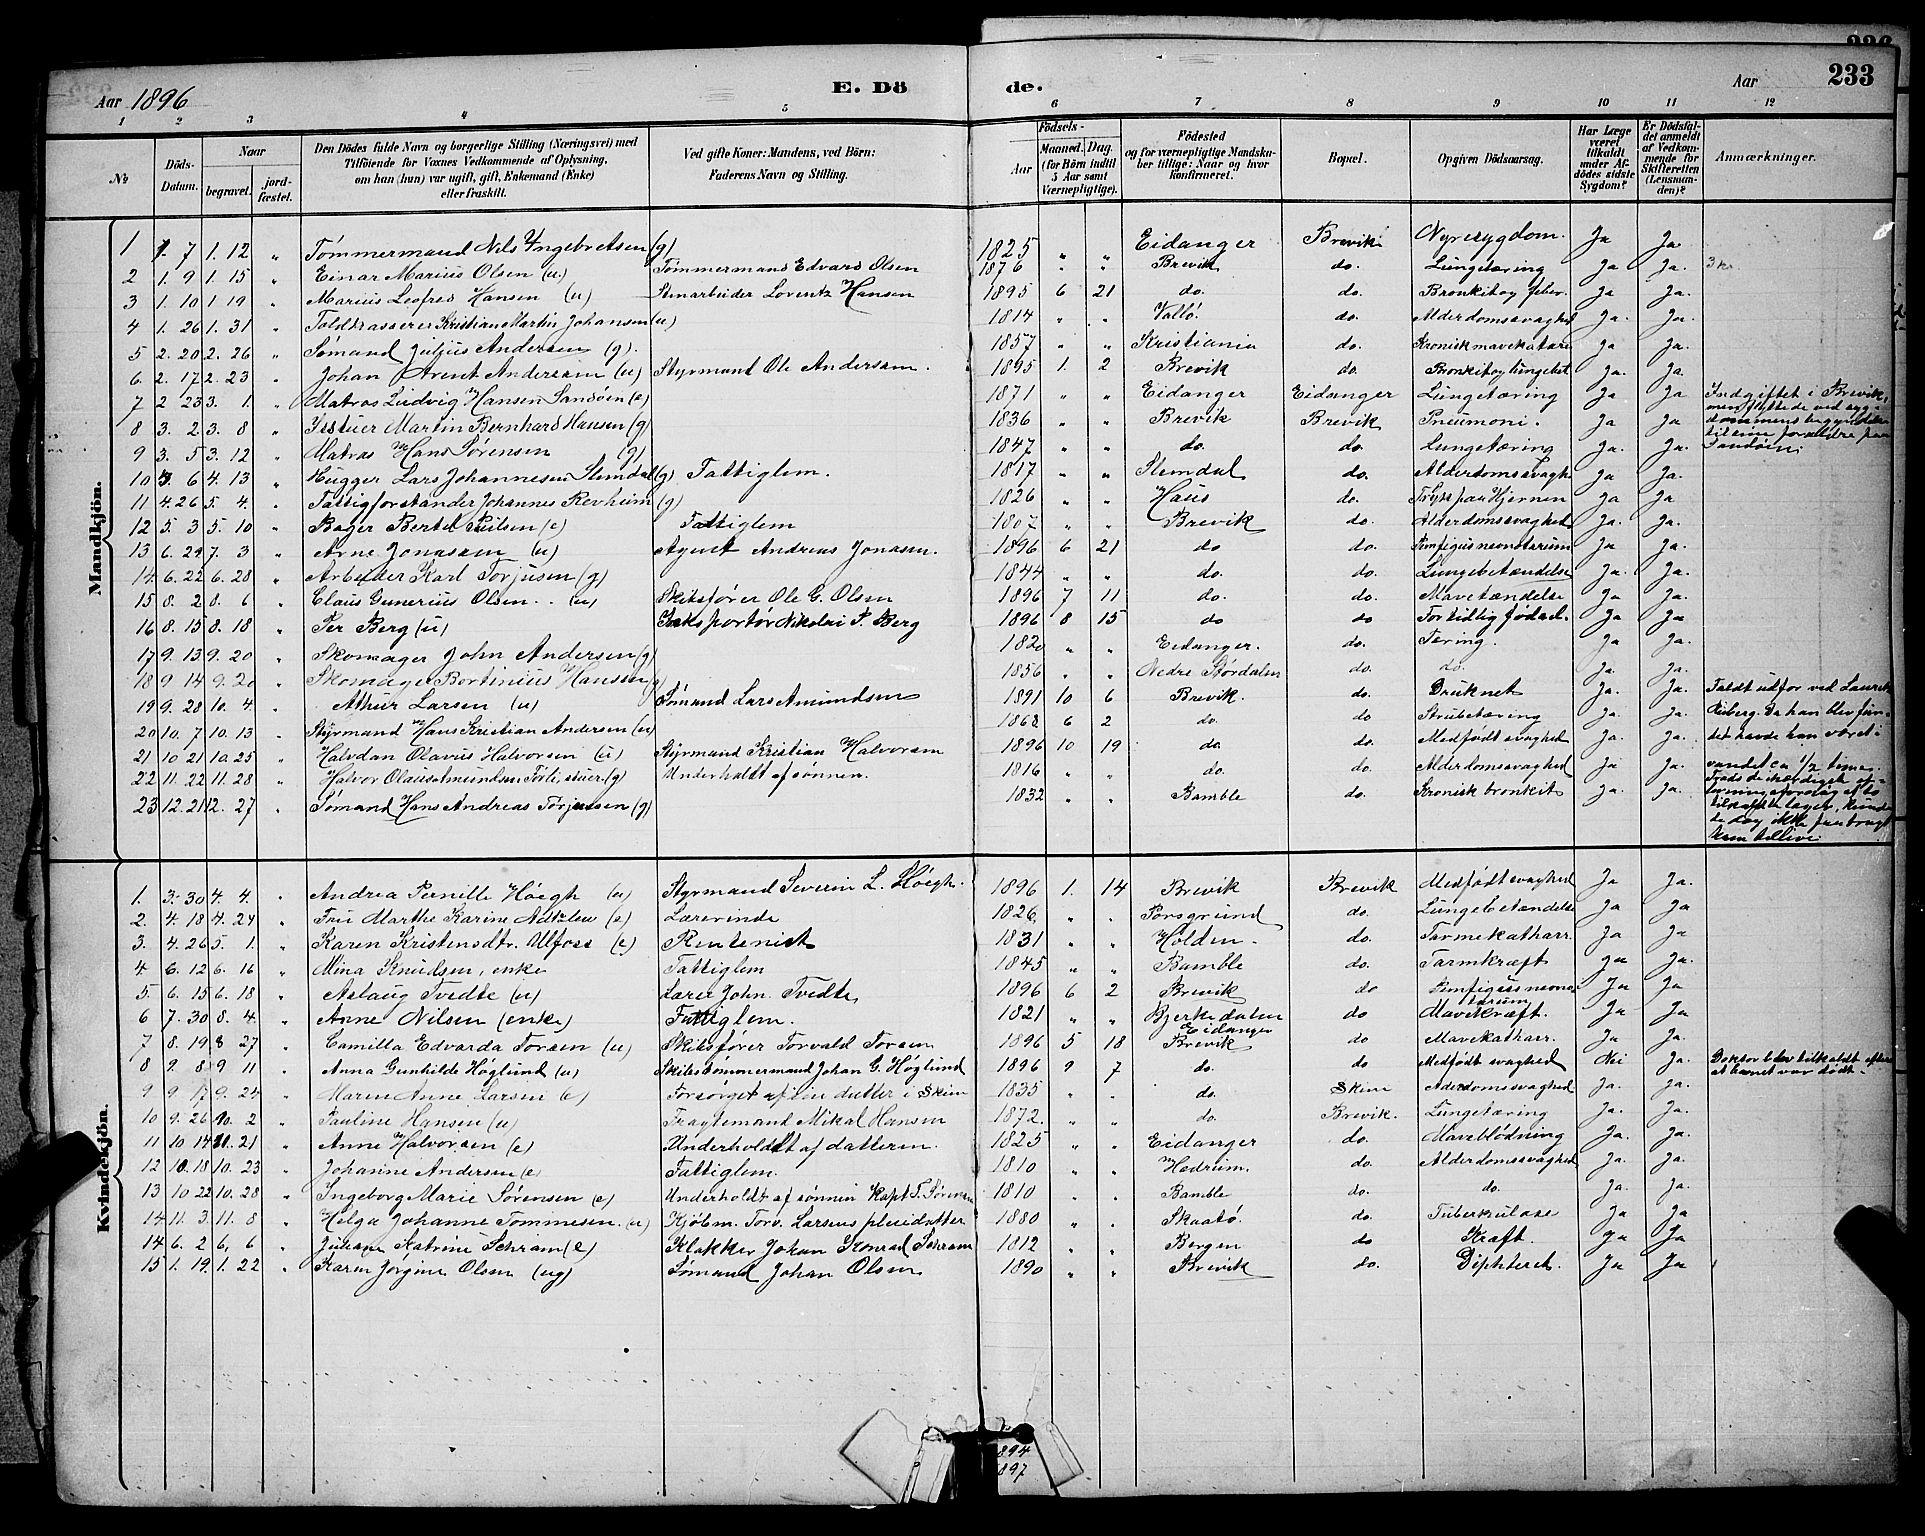 SAKO, Brevik kirkebøker, G/Ga/L0004: Klokkerbok nr. 4, 1882-1900, s. 233